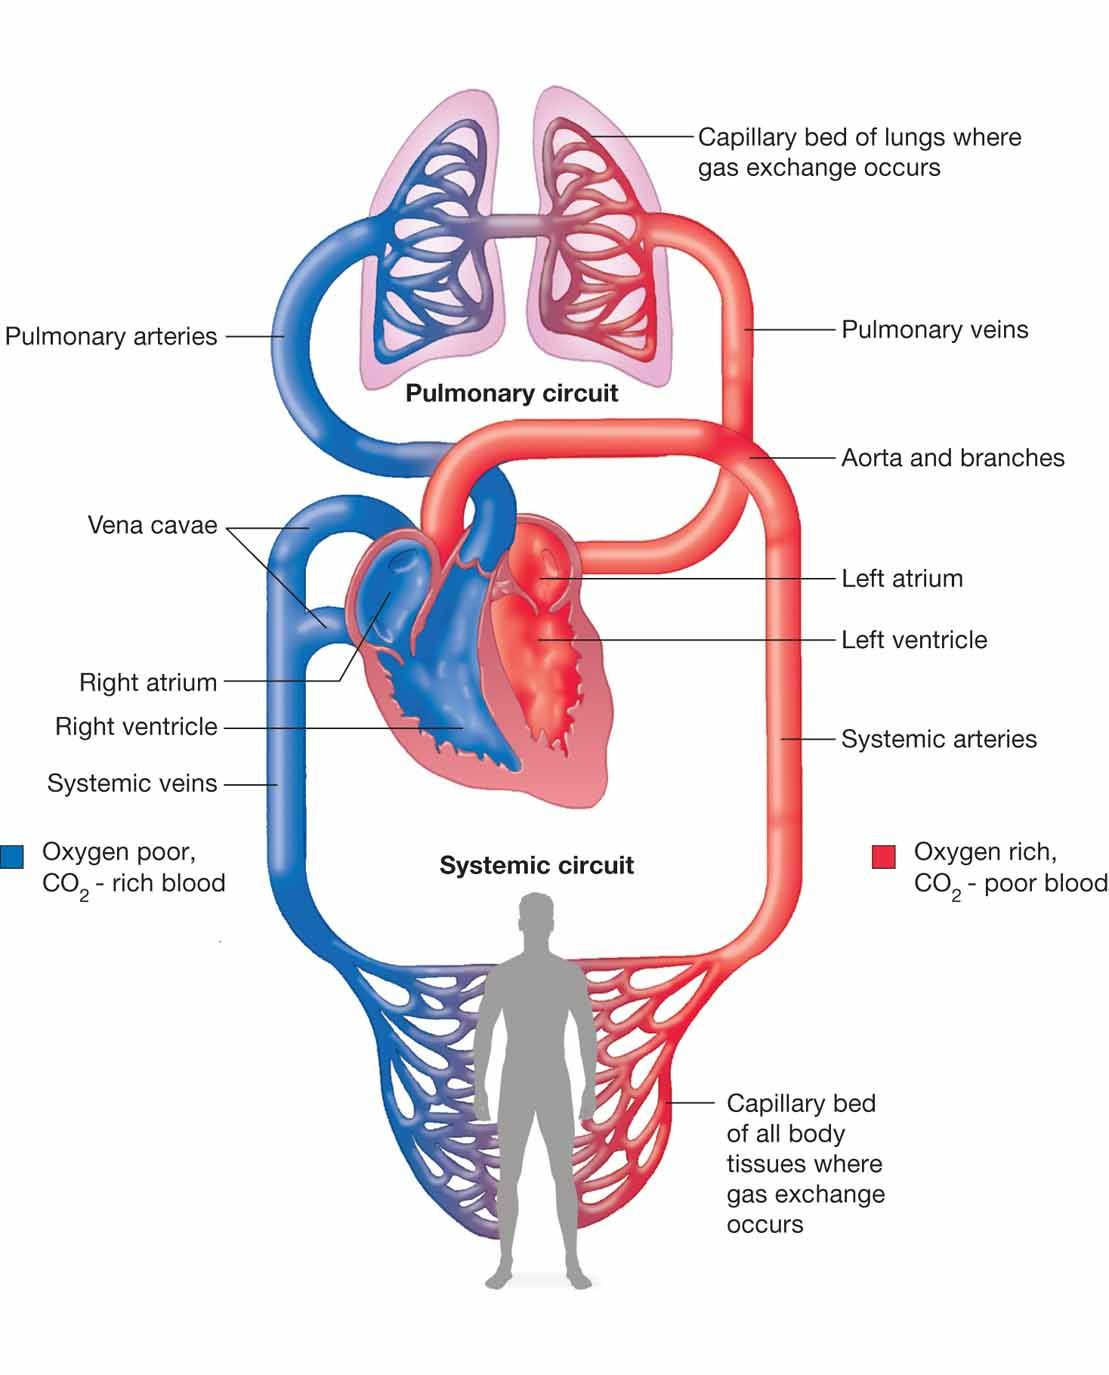 human circulatory system diagram photos systemic and pulmonary circulation 2 [ 1109 x 1375 Pixel ]